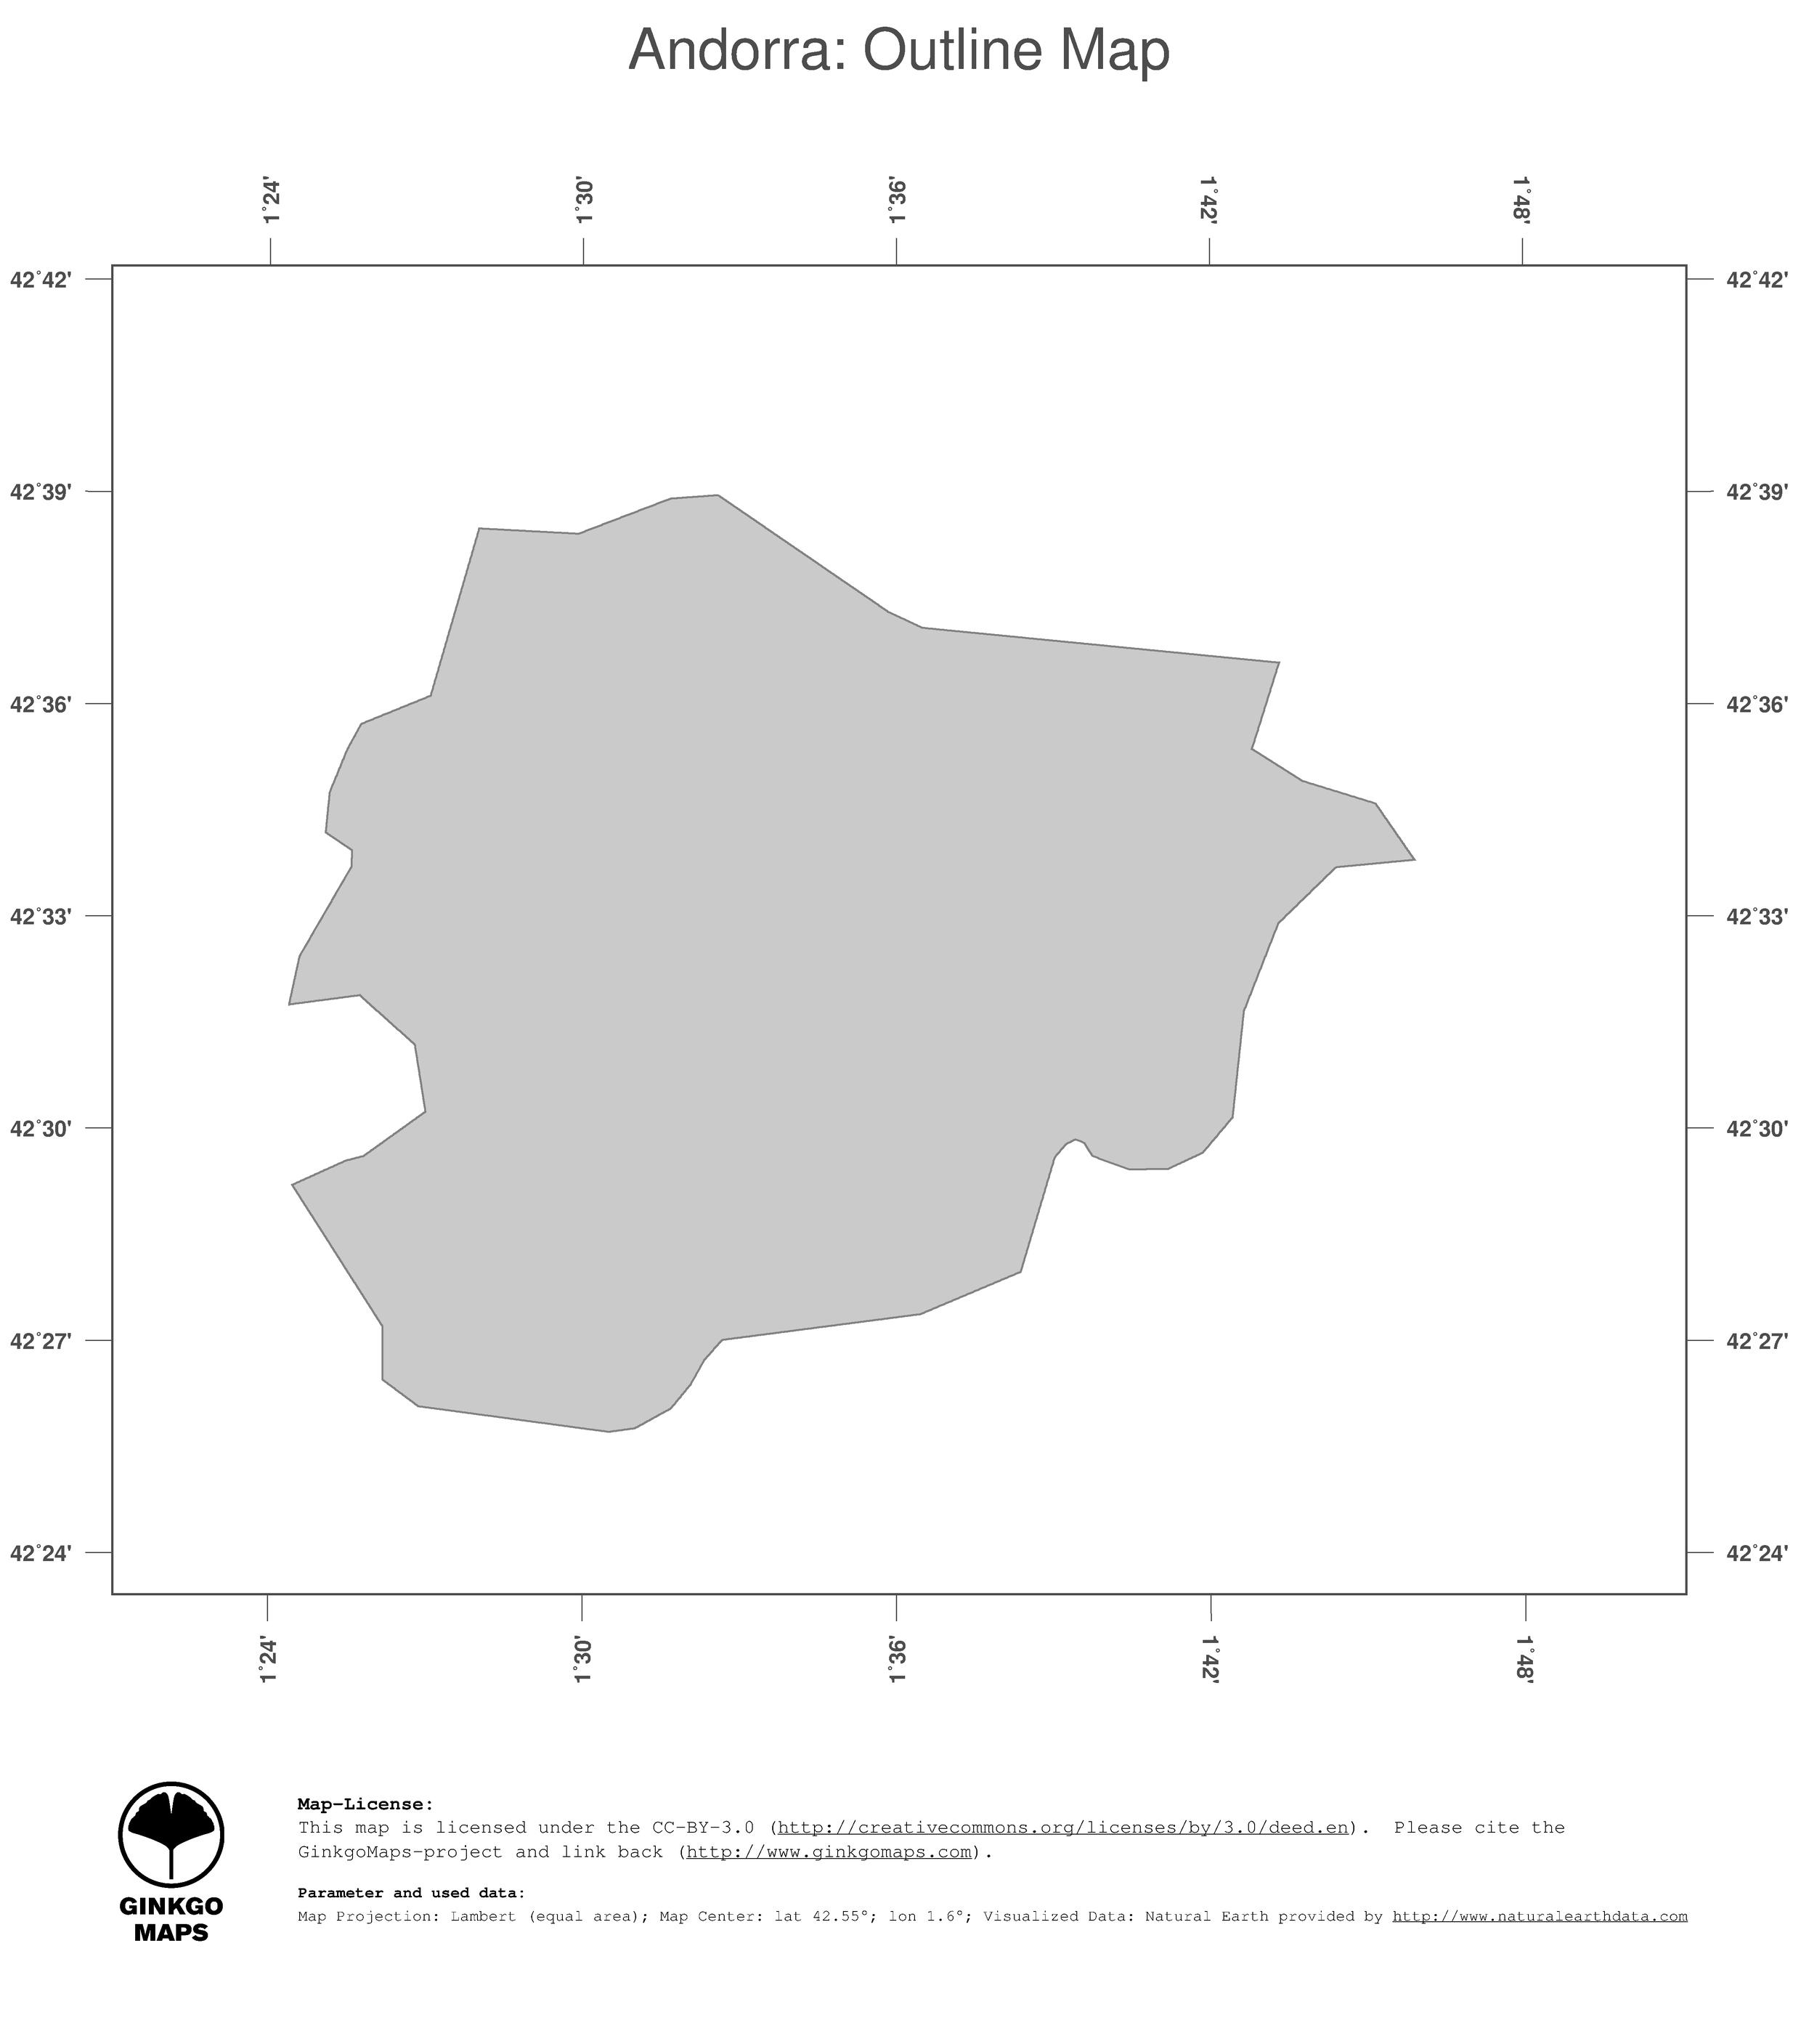 Map Andorra Ginkgomaps Continent Europe Region Andorra